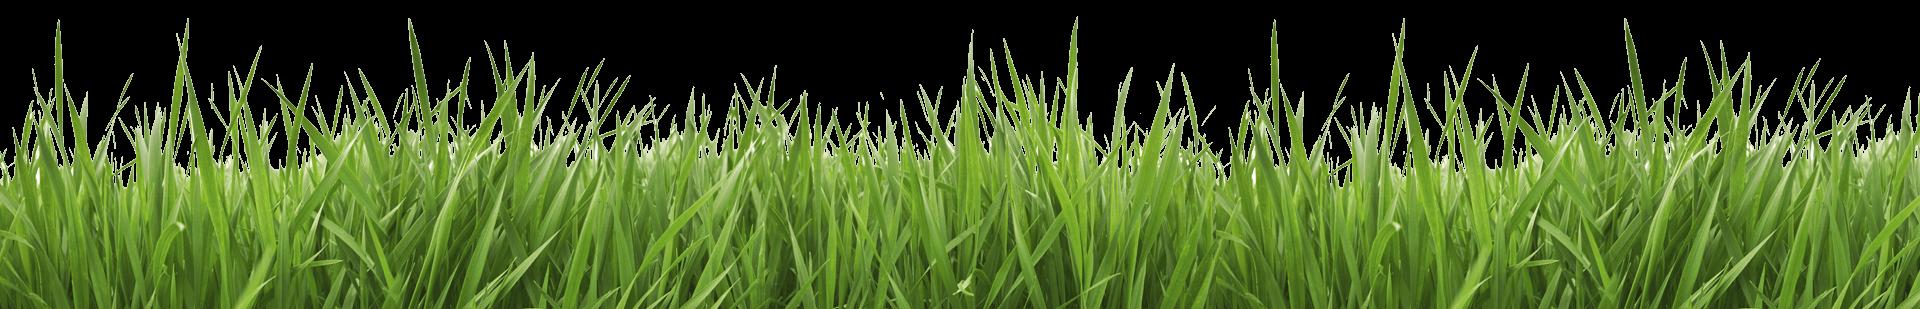 Tree sun grass landscape clipart image library PRO EDGE LAWN CARE LLC image library